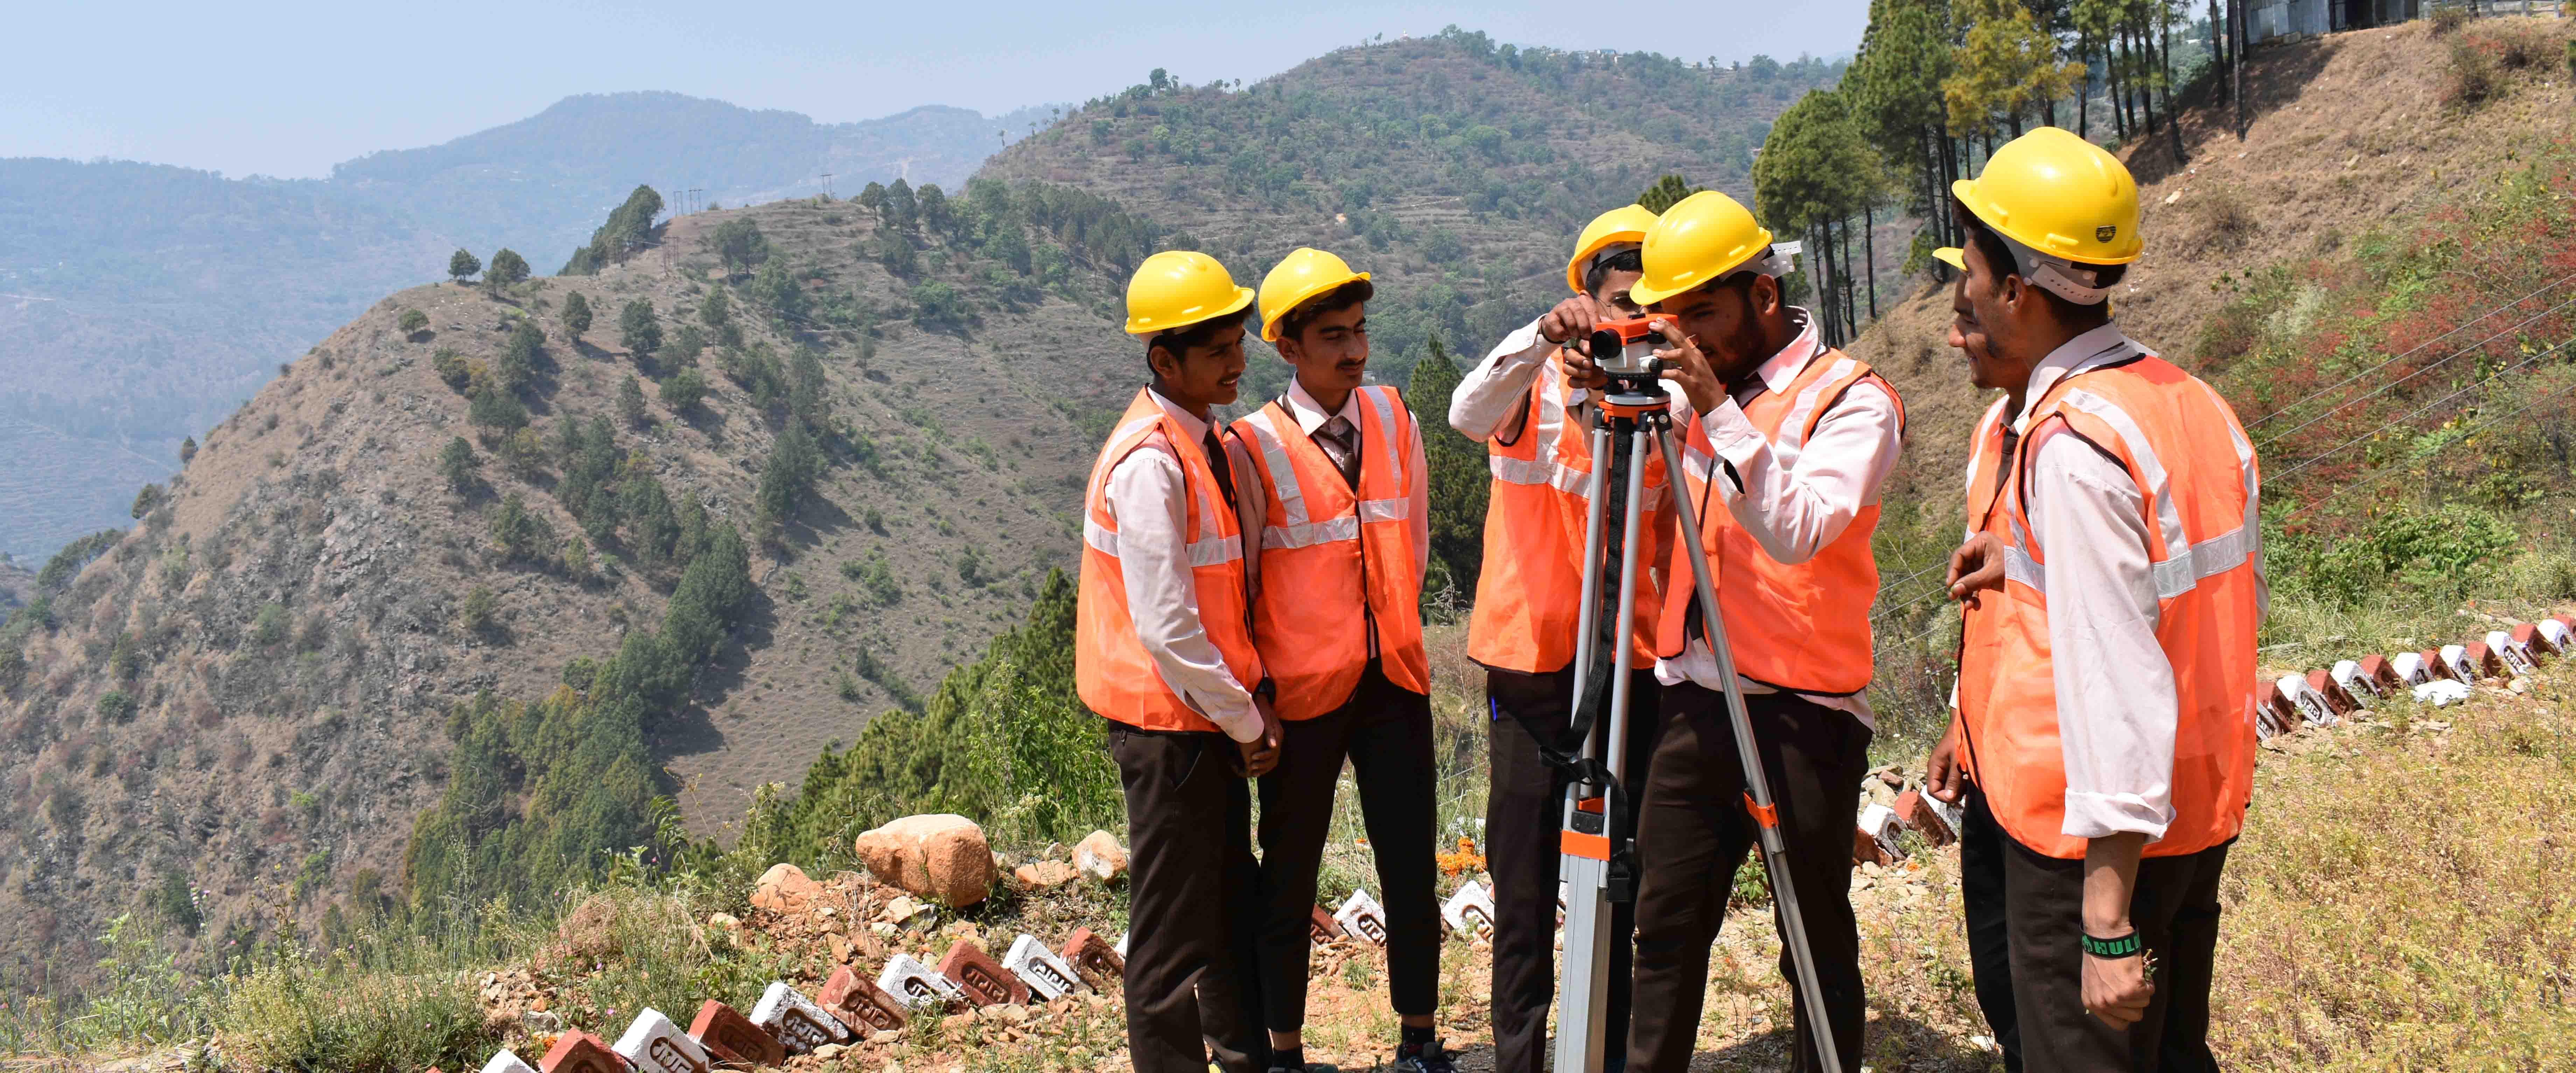 Himalayan Garhwal University Campus